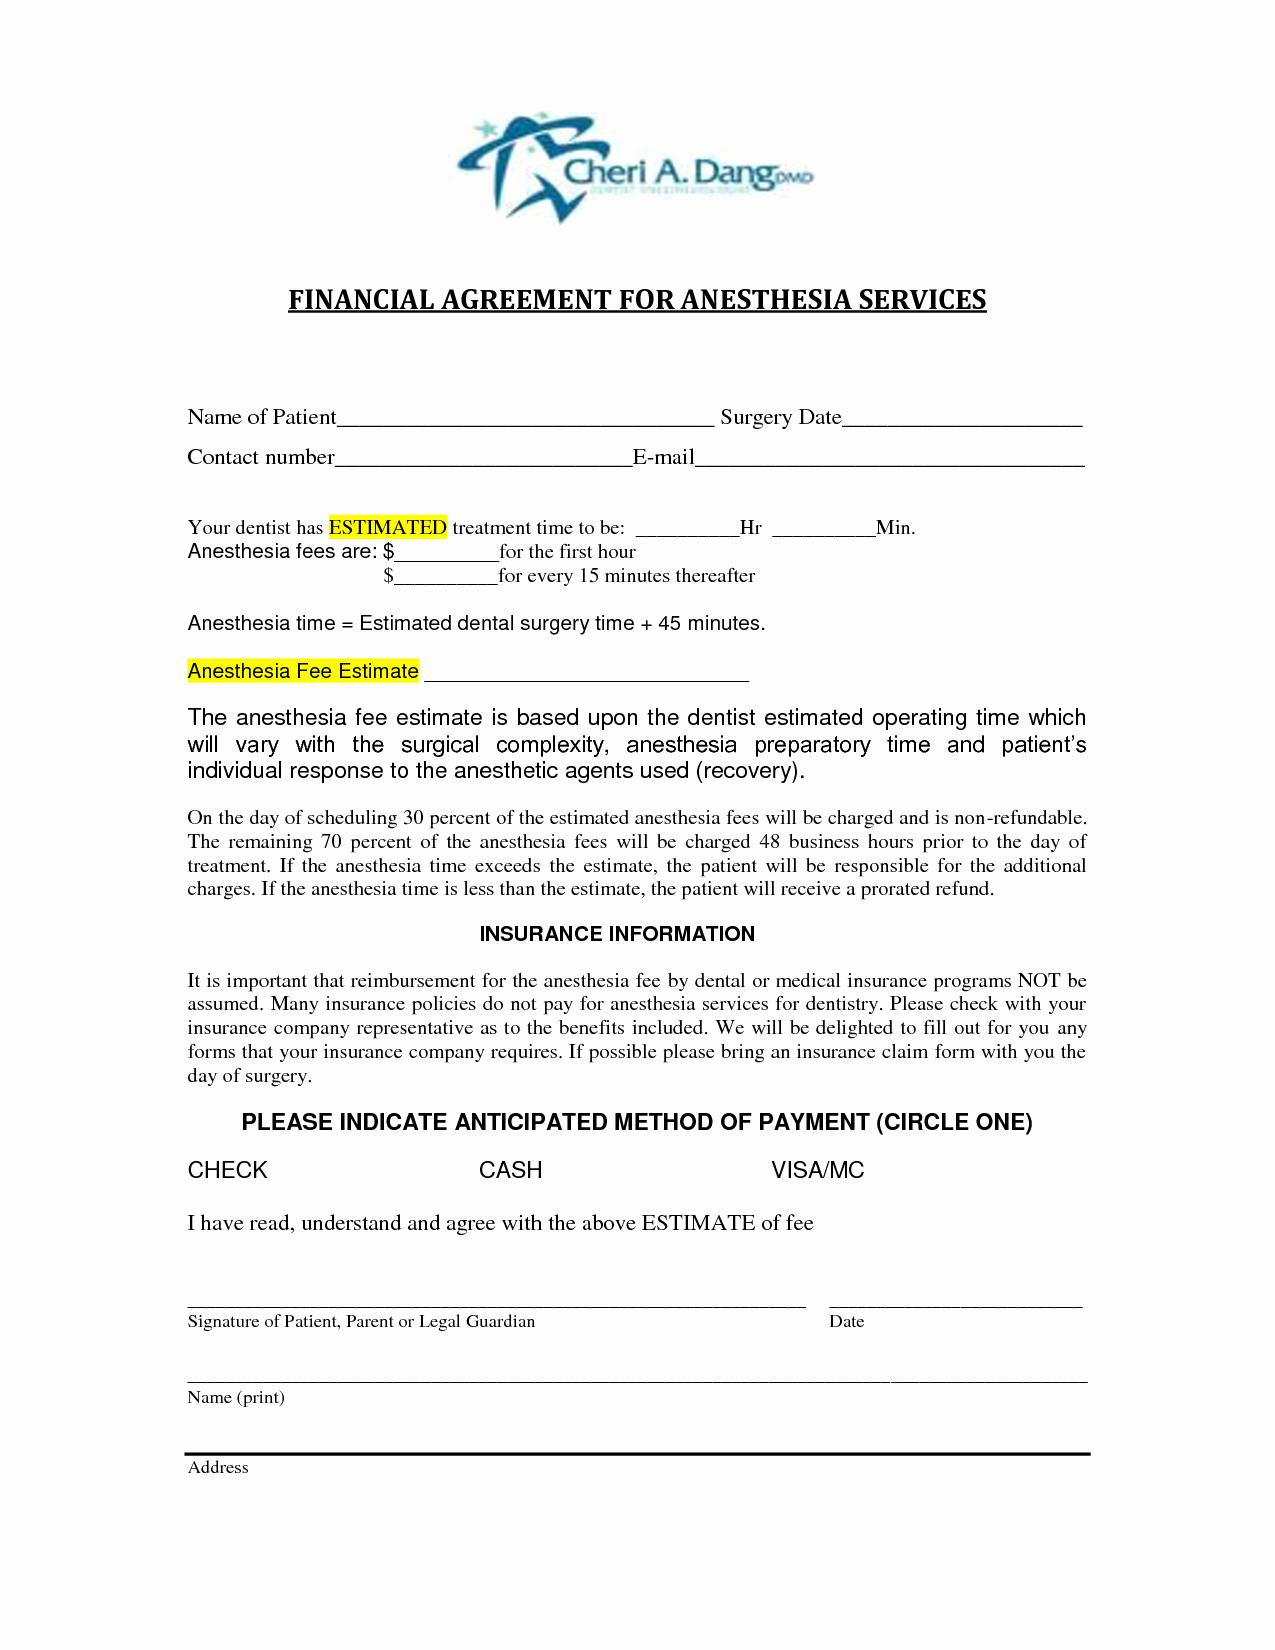 Dental Financial Agreement Template Lovely 6 Best Of Dental Financial Agreement Template